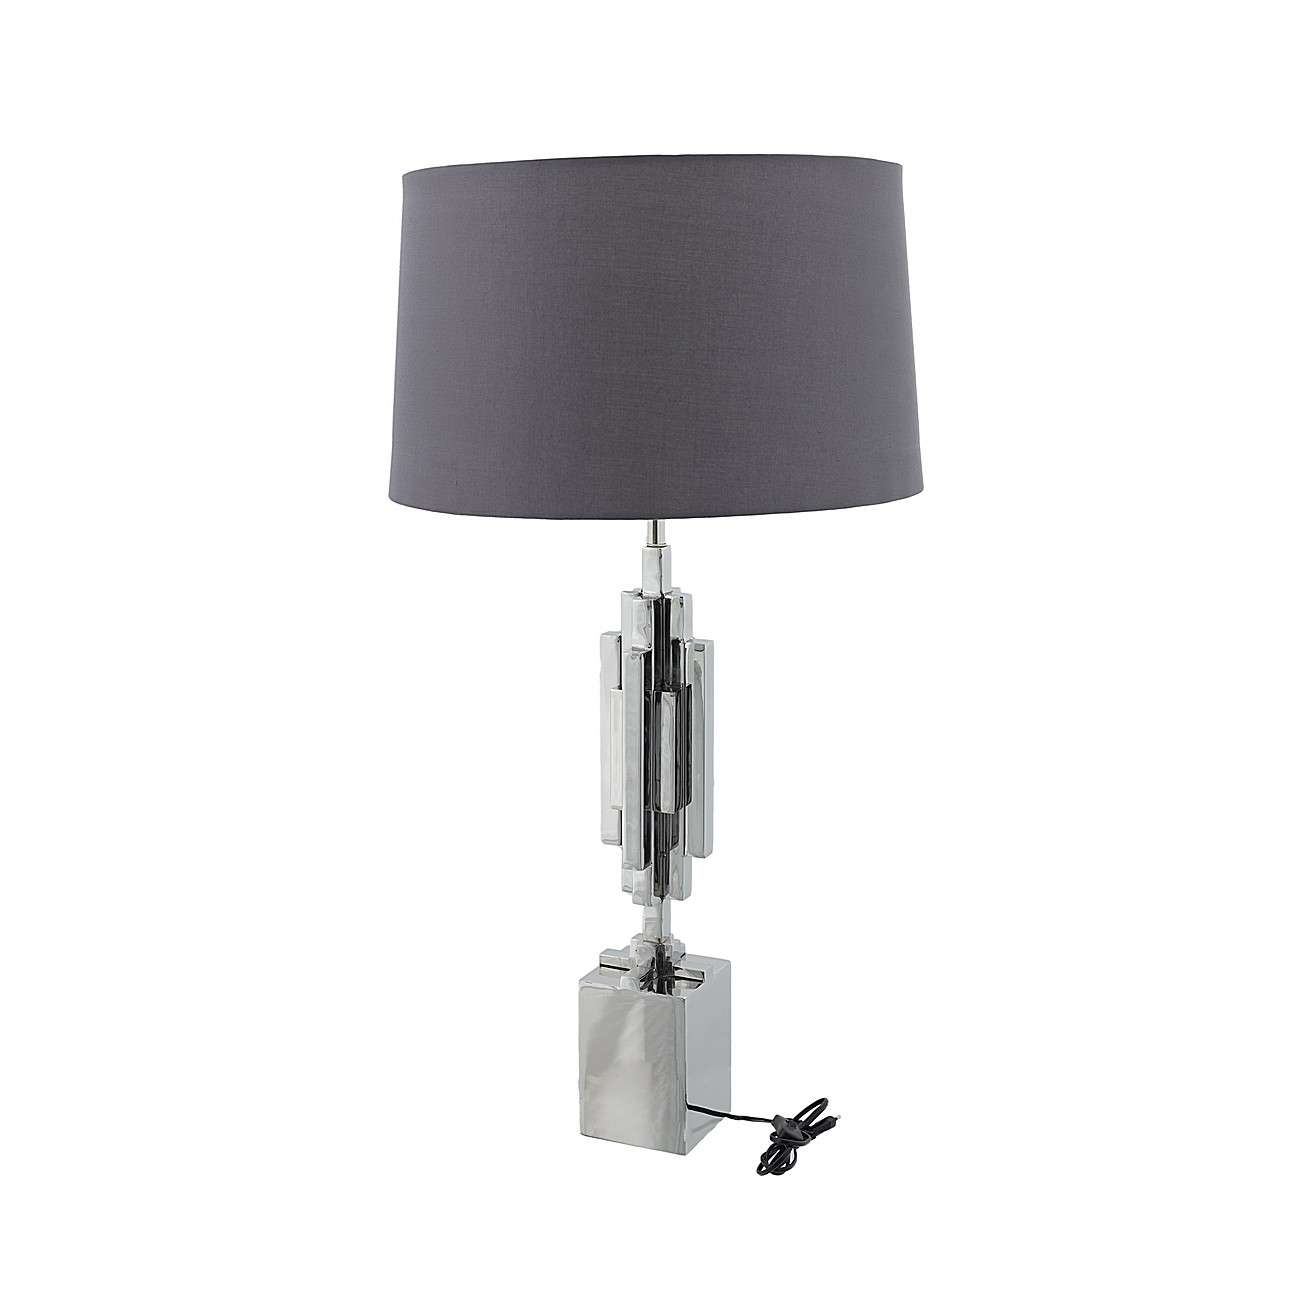 Lampa stołowa Canzone